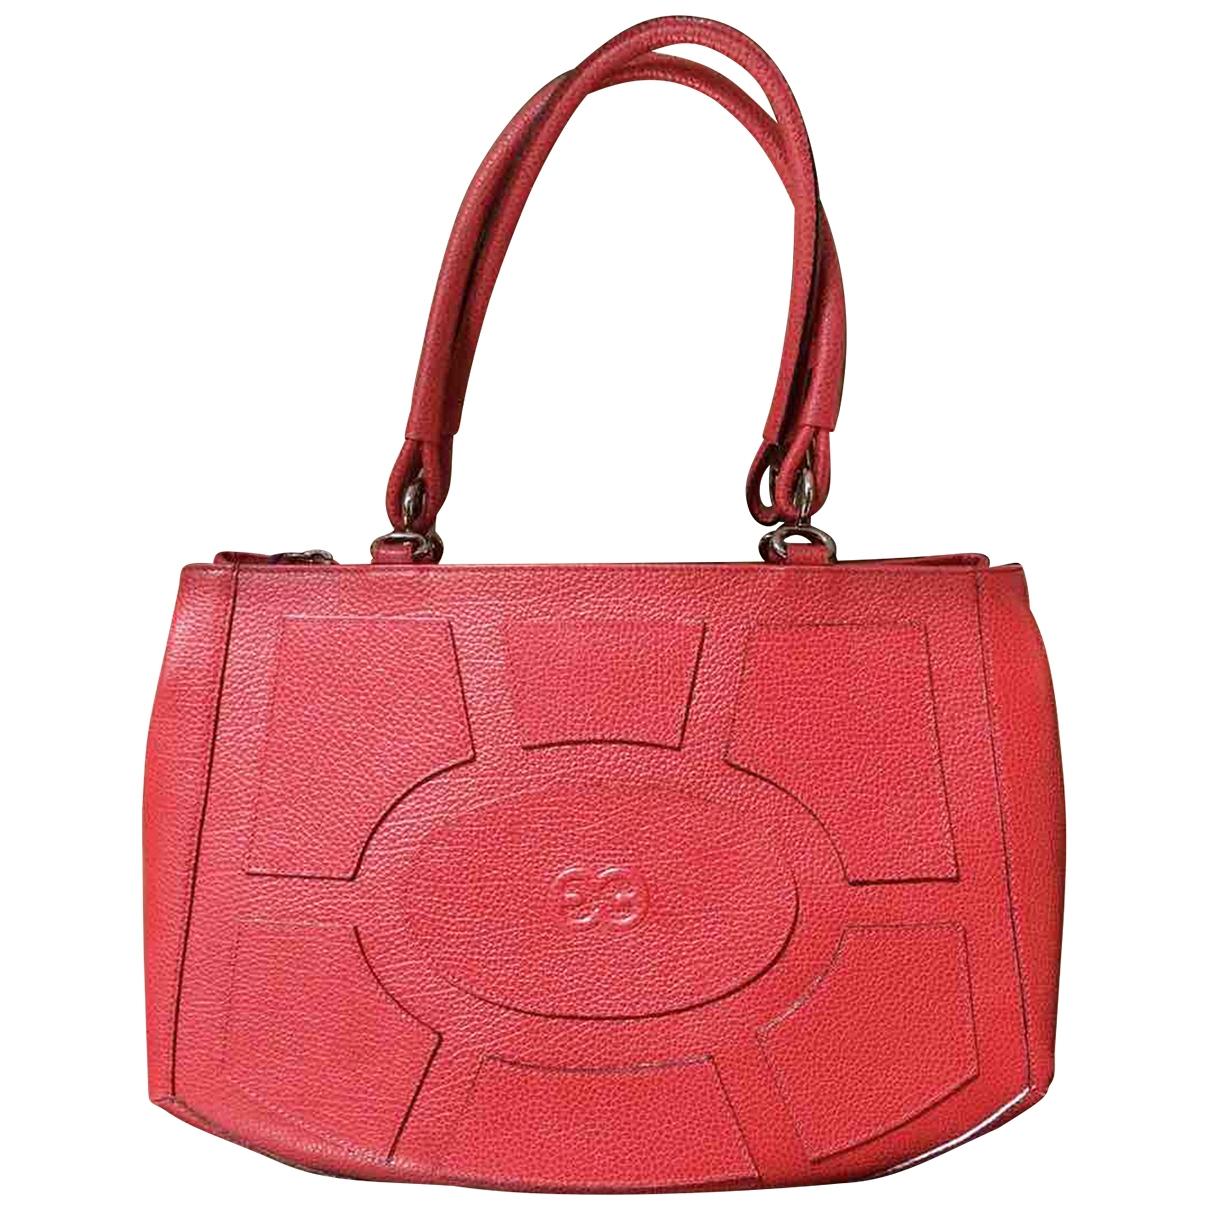 Escada \N Handtasche in  Rot Leder